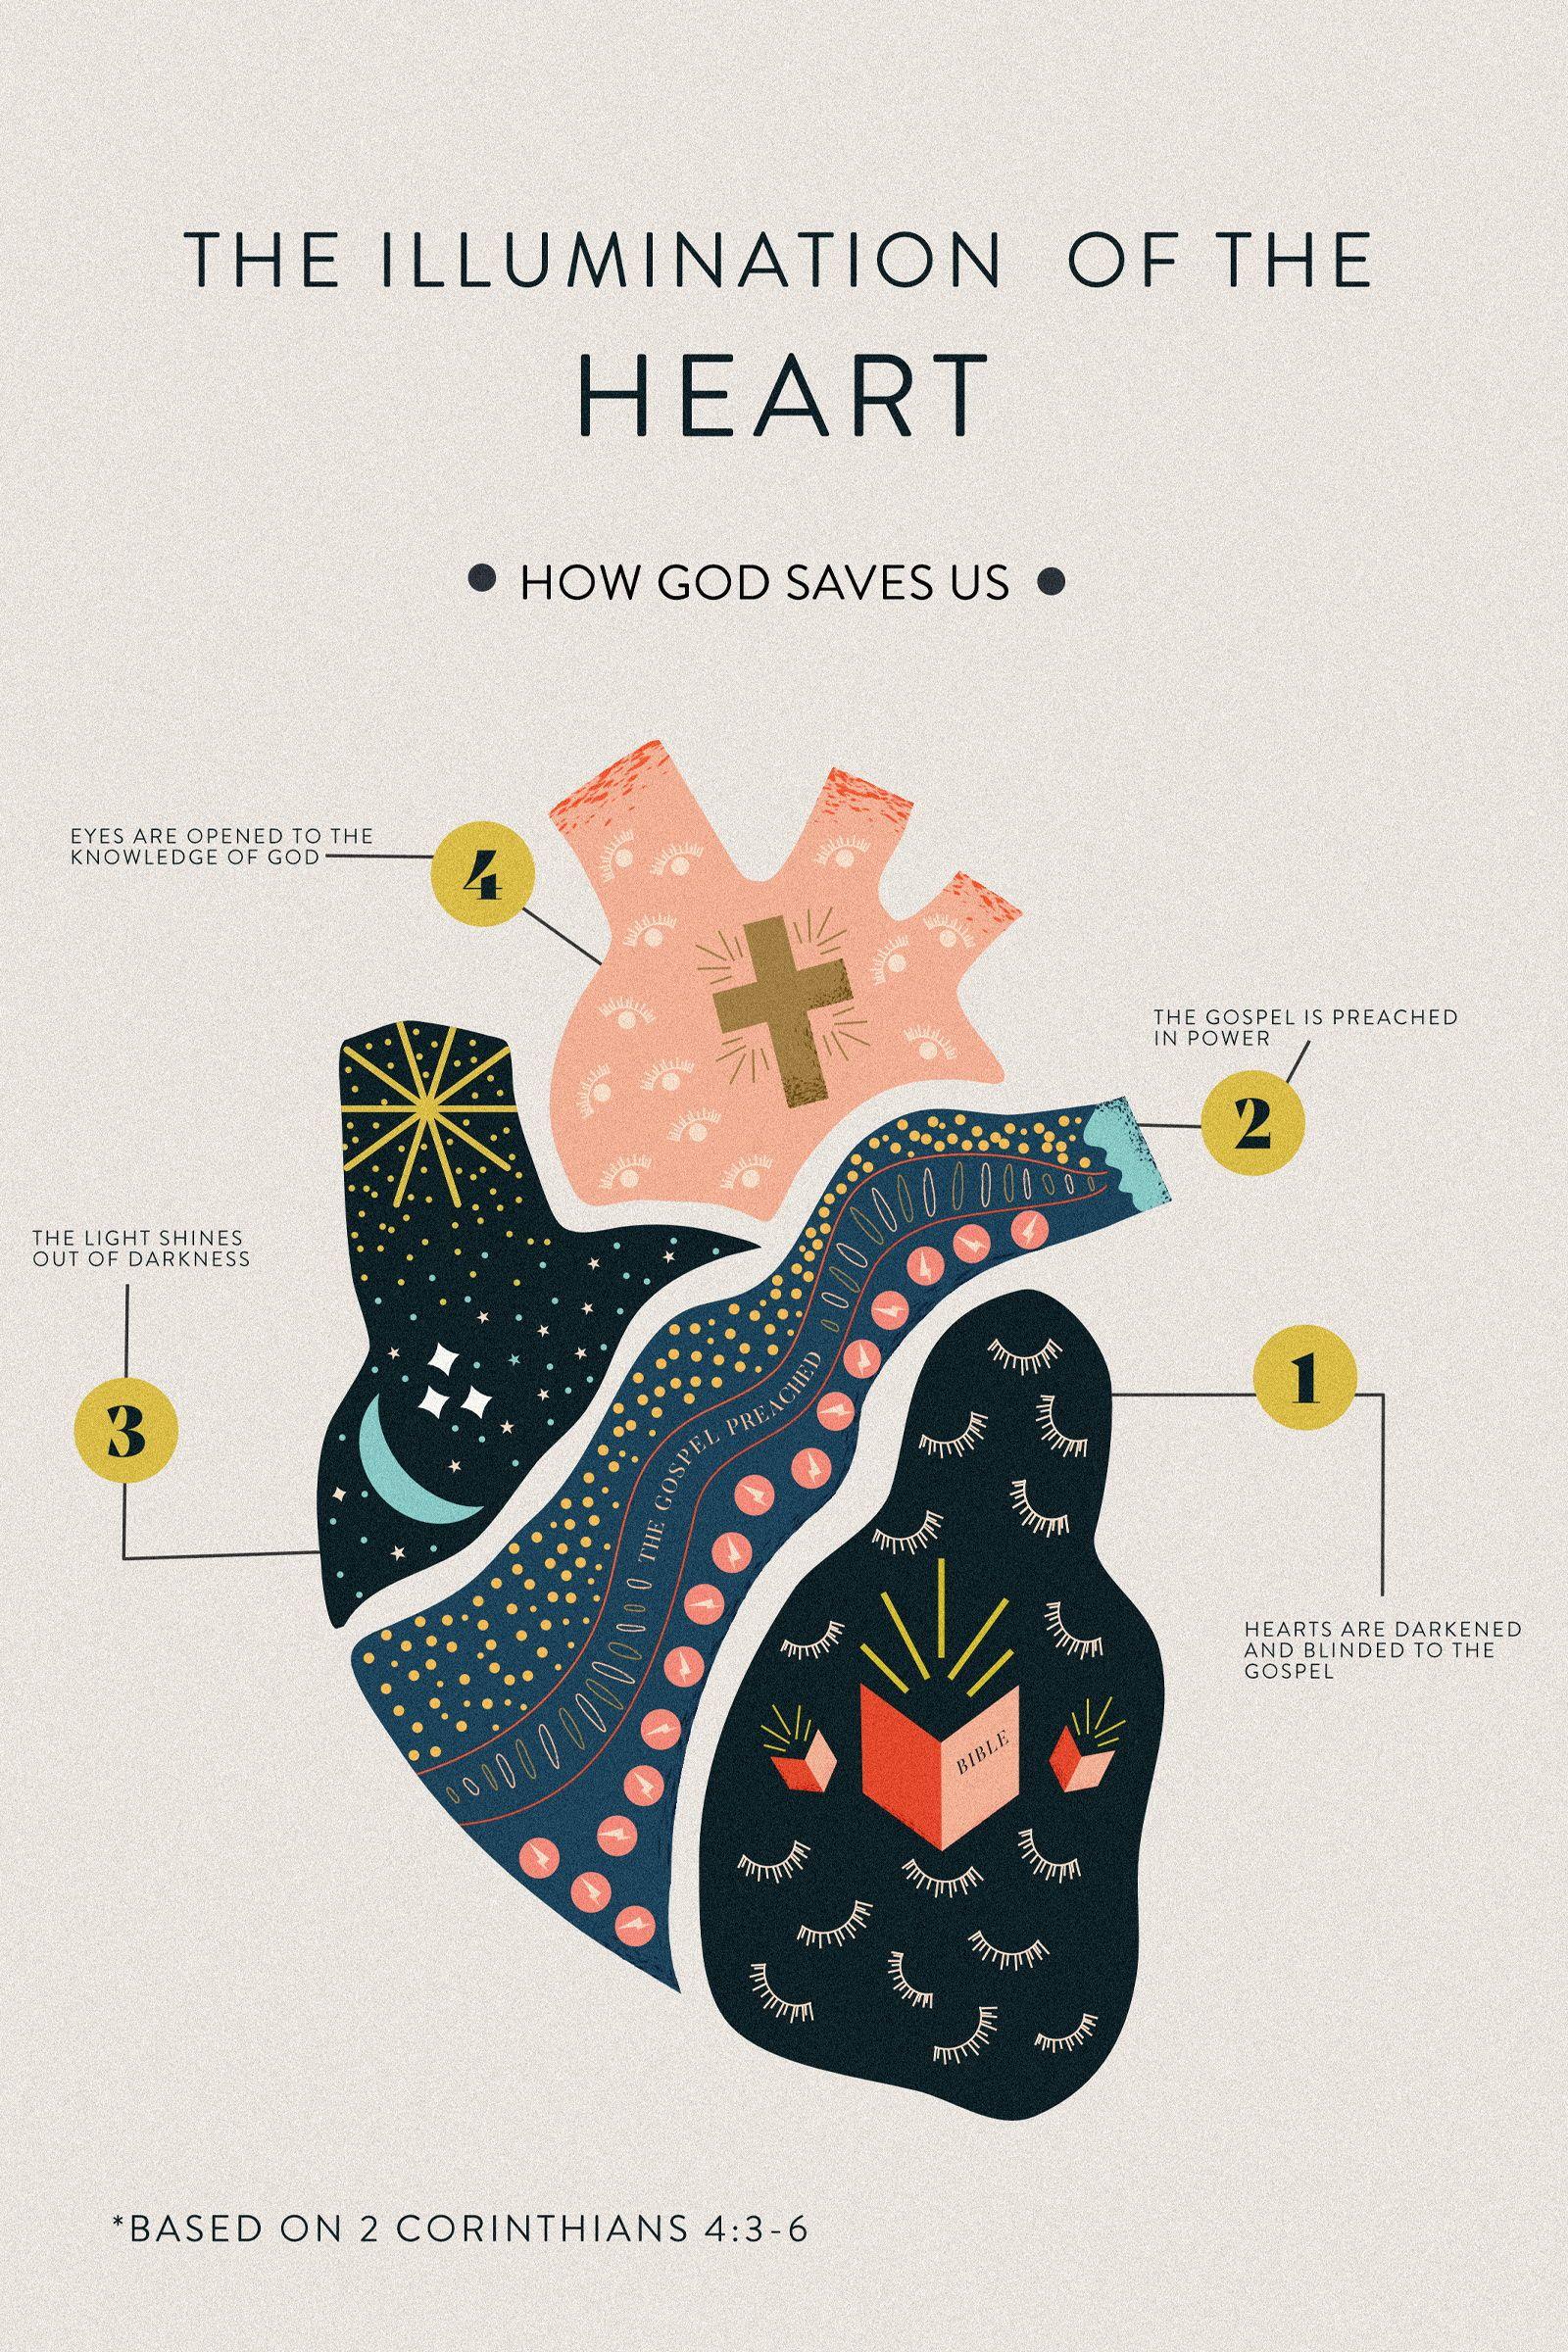 The Illumination of The Heart